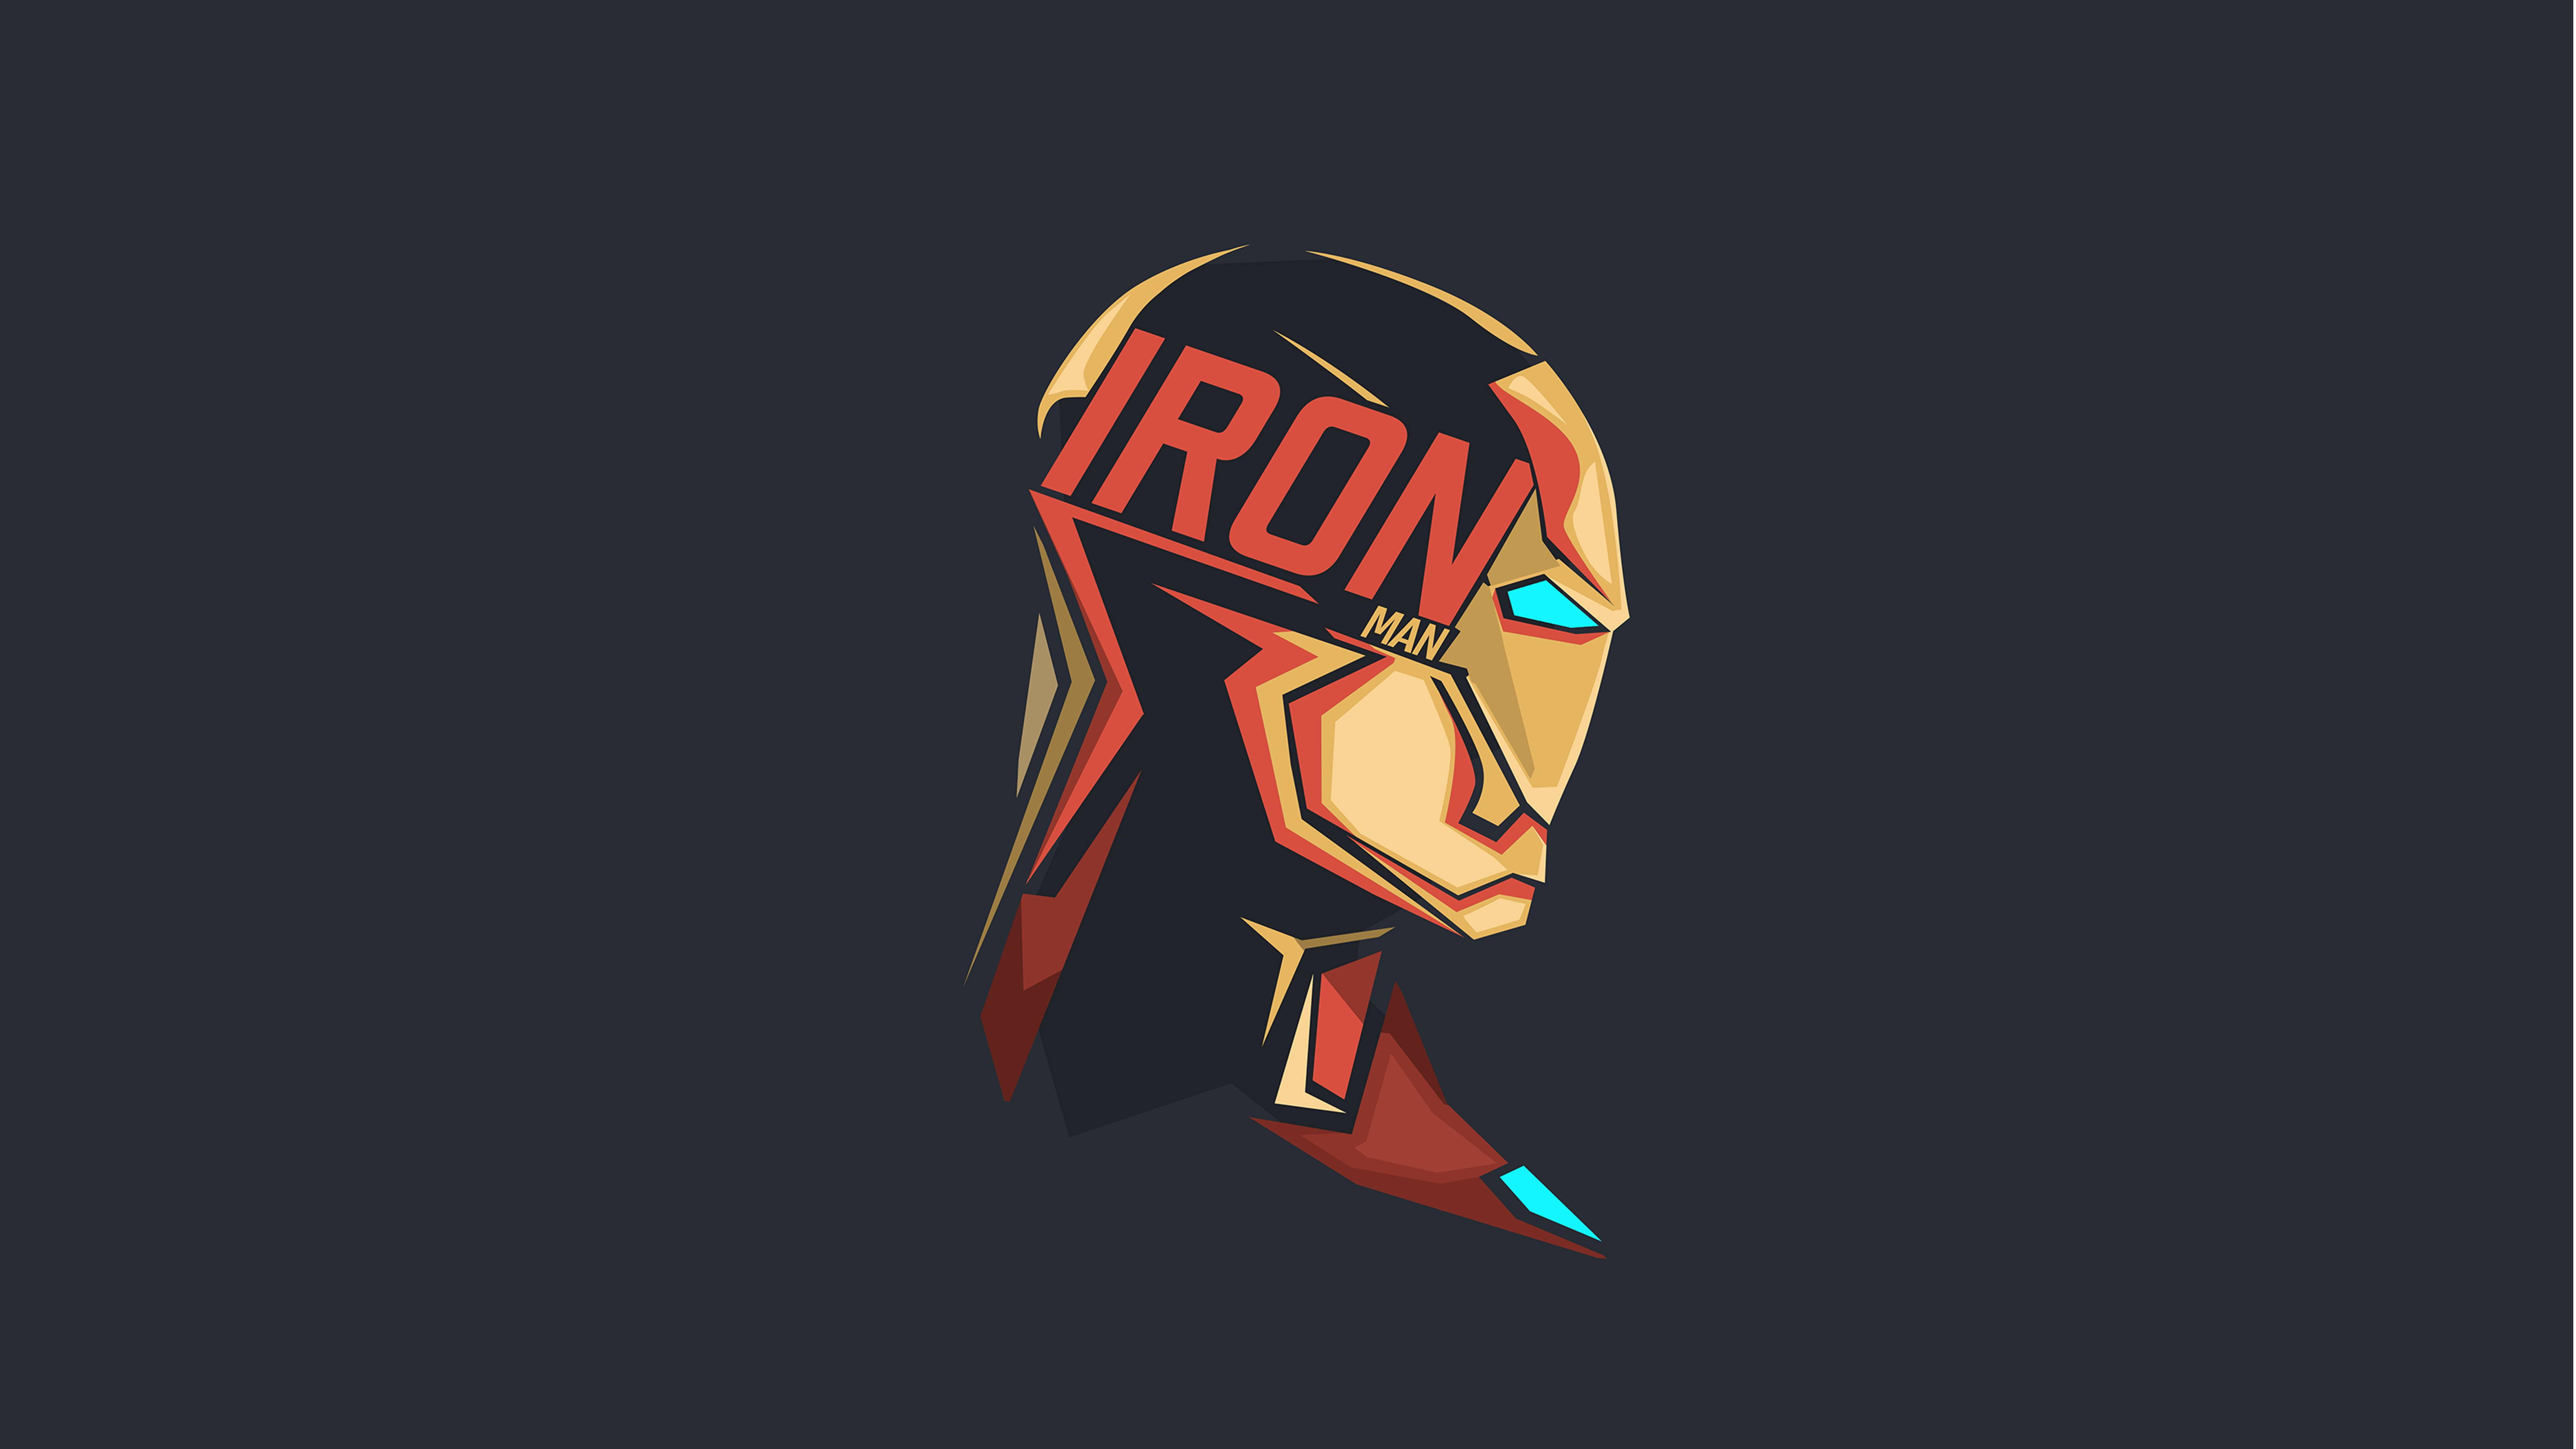 Iron Man Wallpaper 66 7680x4320